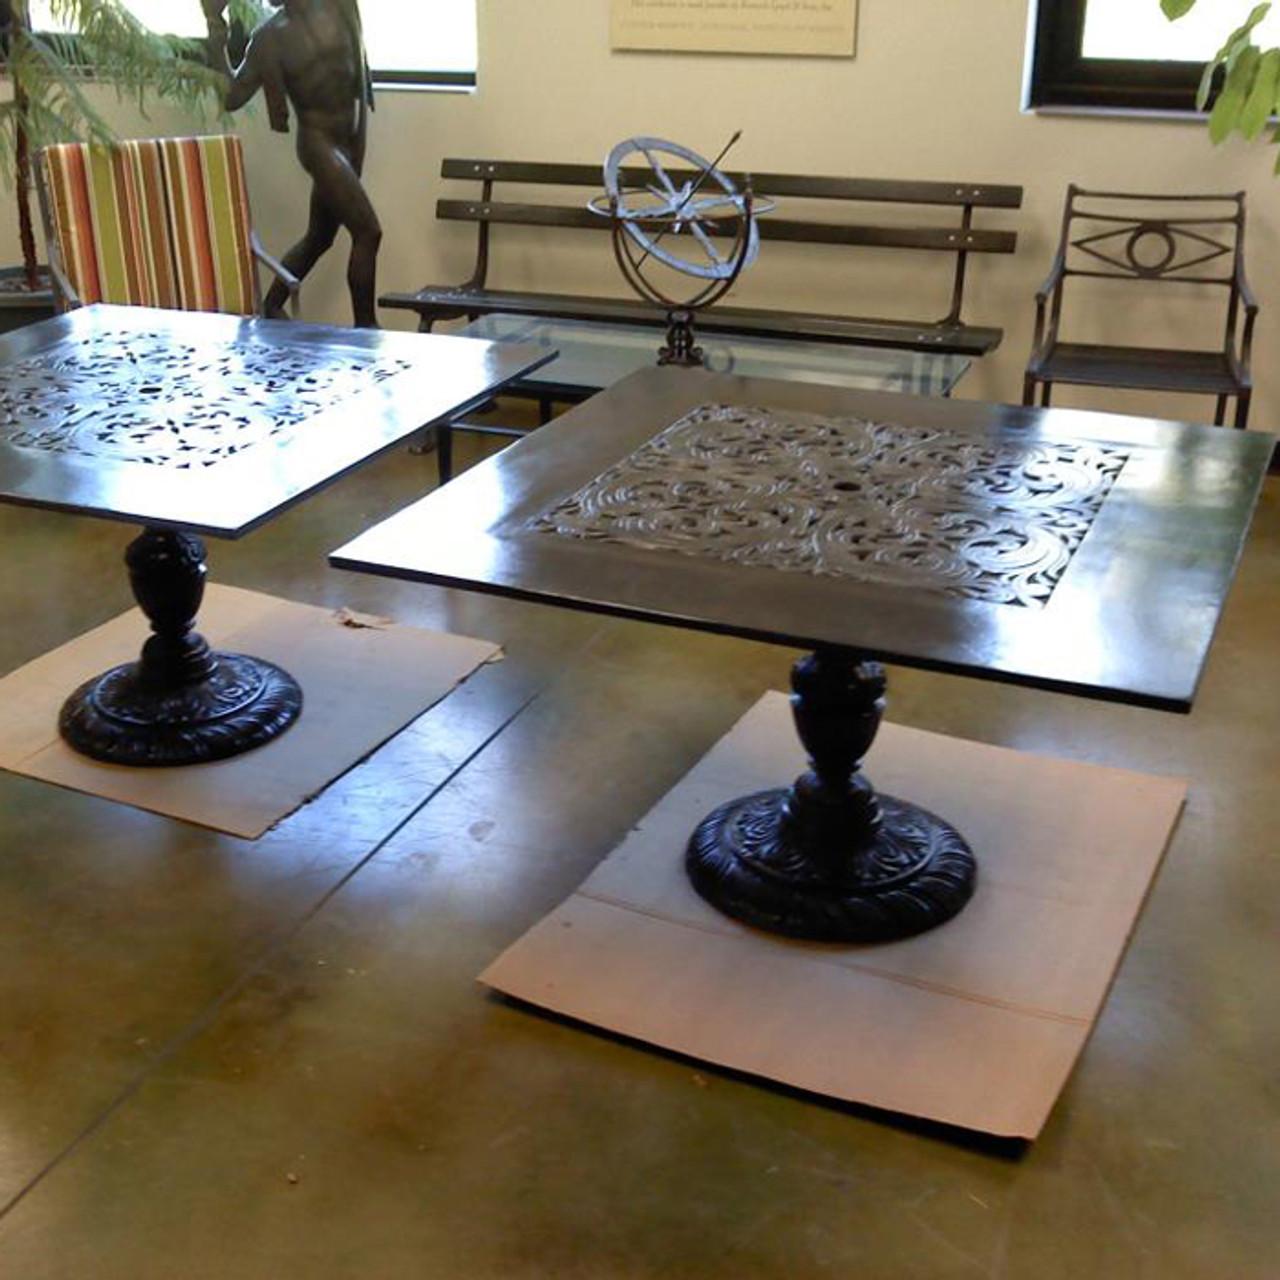 Amazing Filigree Design 48 Square Dining Table With Pedestal Leg Interior Design Ideas Gresisoteloinfo